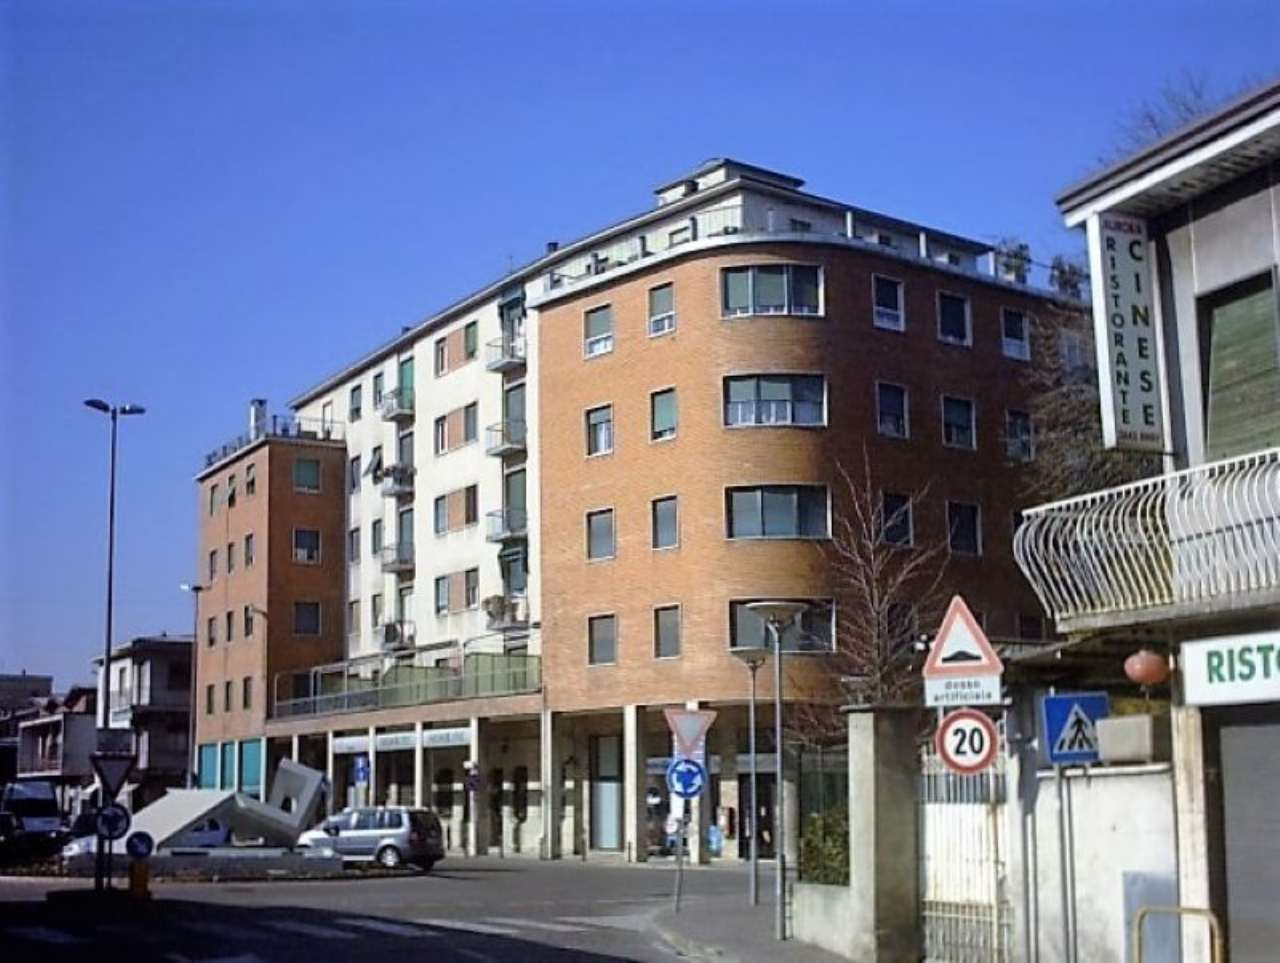 appartamento di 3 locali in vendita a Cabiate (CO)